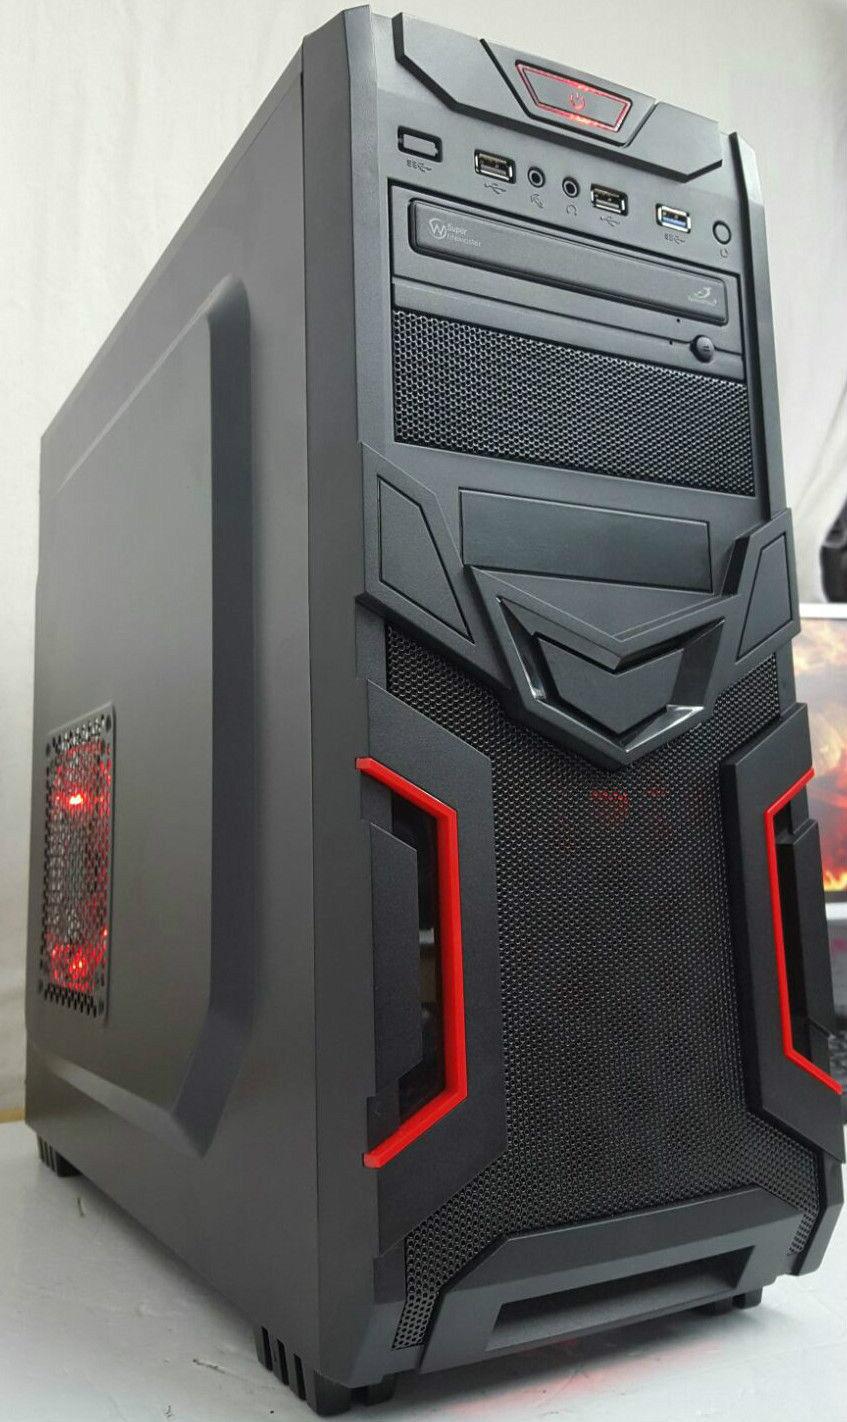 Computer Games - ULTRA FAST GAMING PC COMPUTER INTEl i3 @ 3.10GHz 4GB RAM 500GB HDMI WINDOWS 10